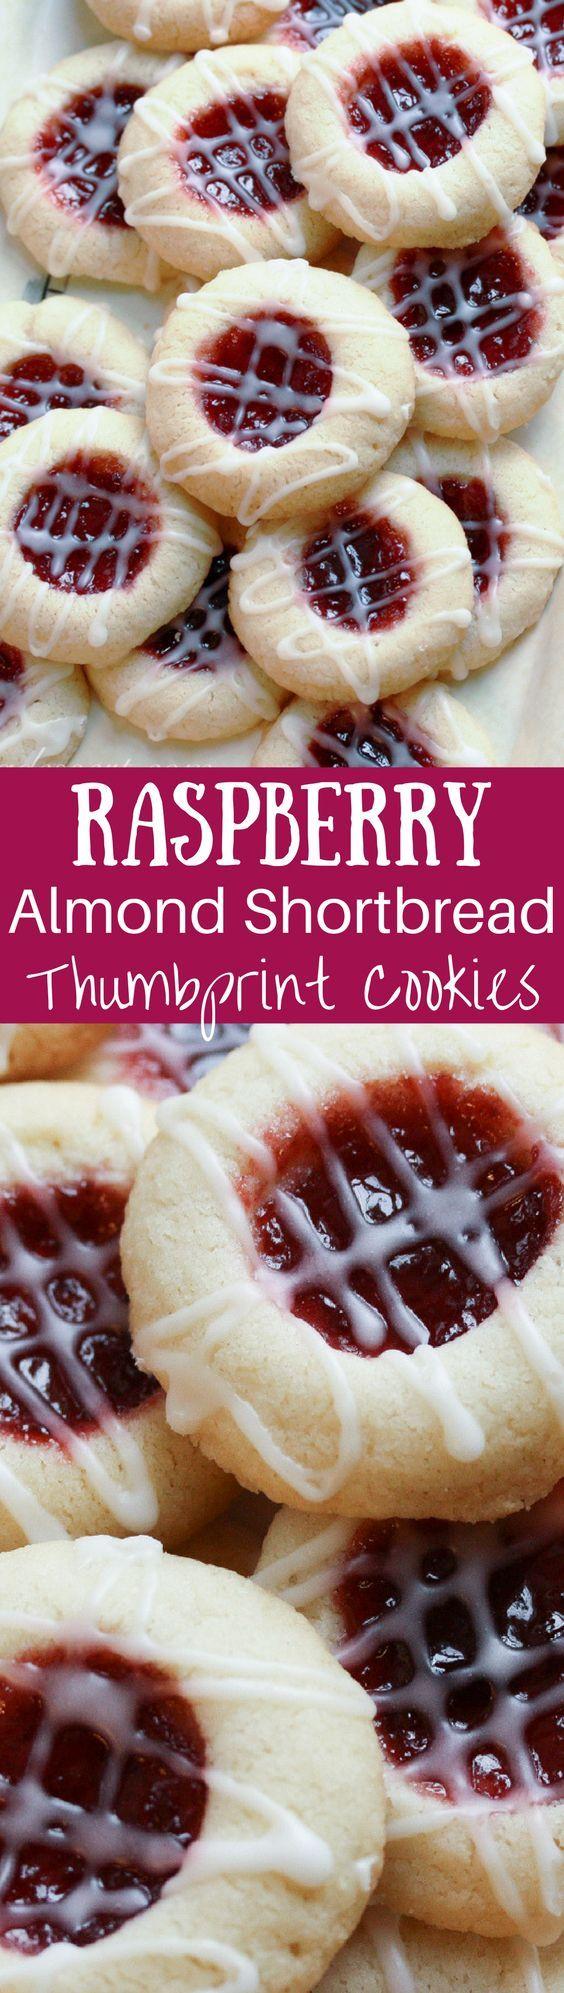 Raspberry Almond Shortbread Thumbprints ~ The Great Food Blogger Cookie Swap 2012 | Recipe